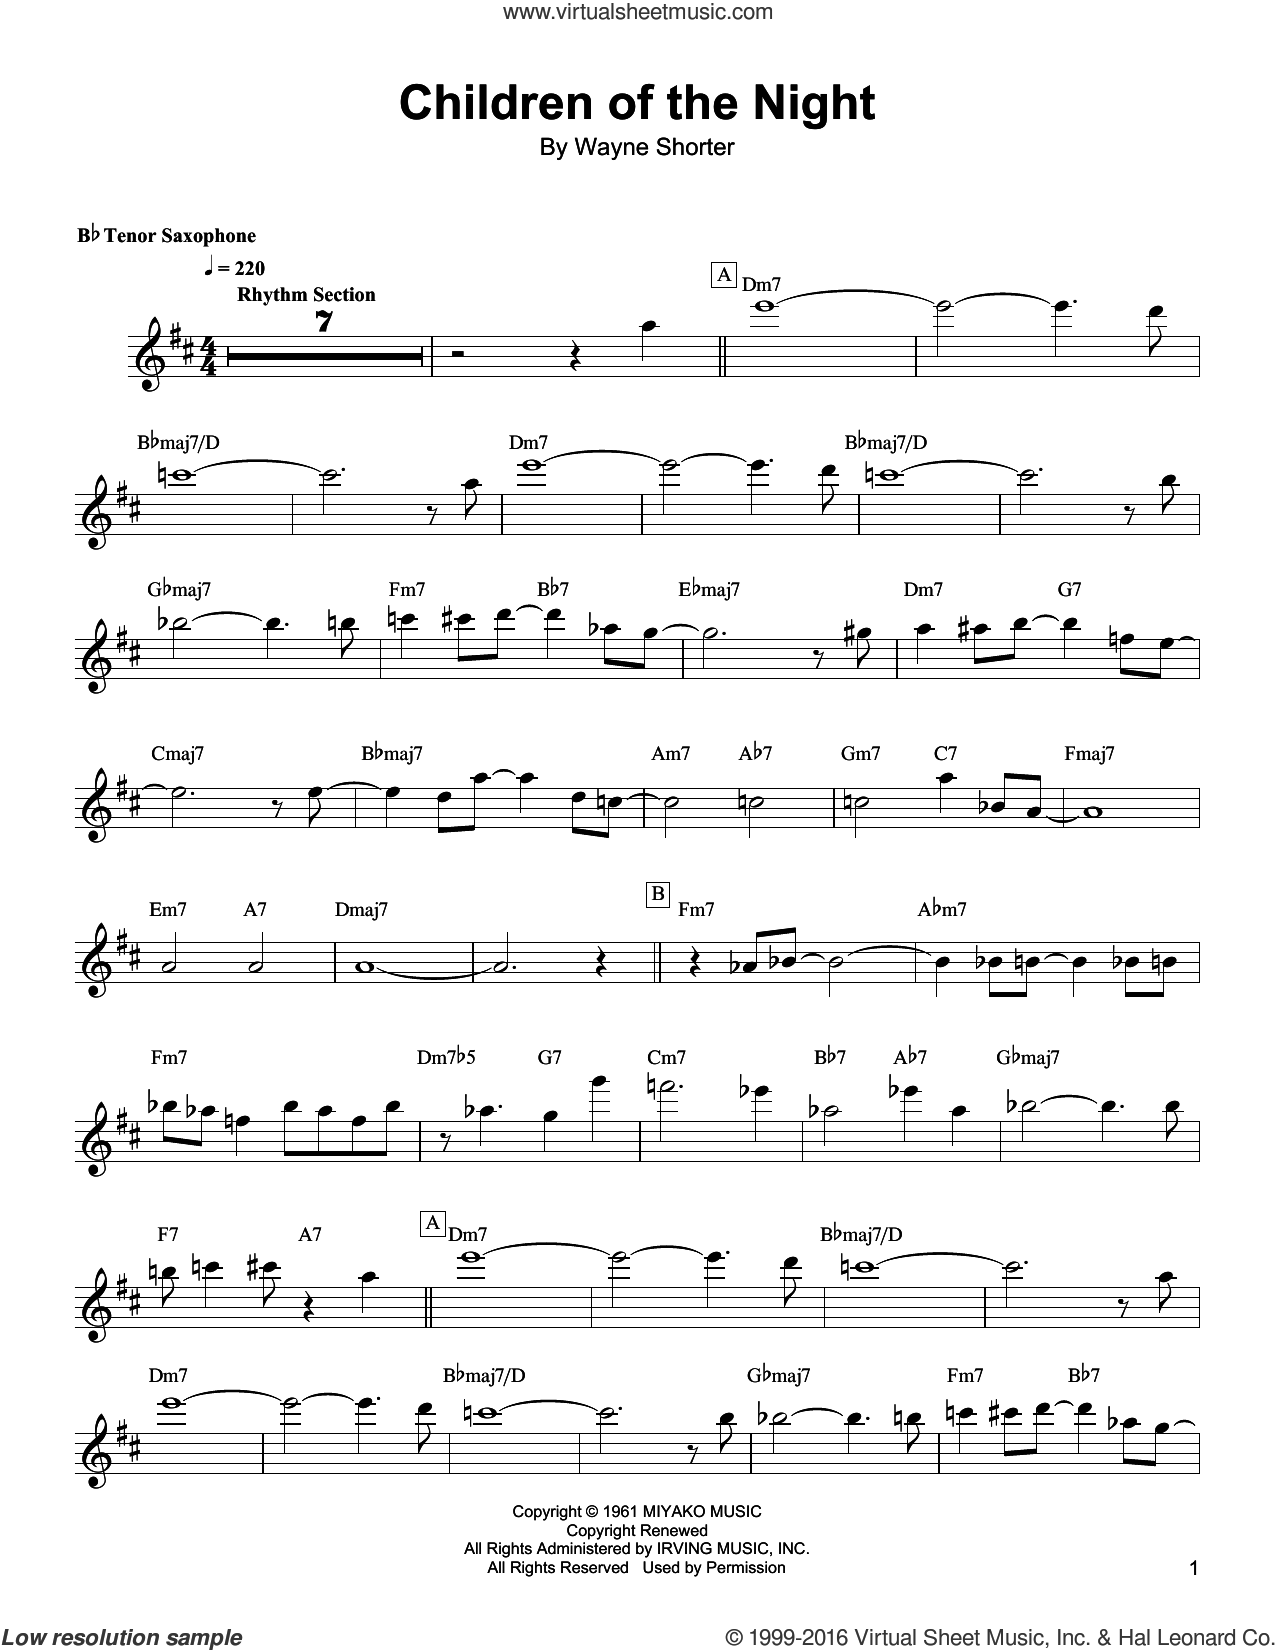 Children Of The Night sheet music for tenor saxophone solo (transcription) by Wayne Shorter, intermediate tenor saxophone (transcription)